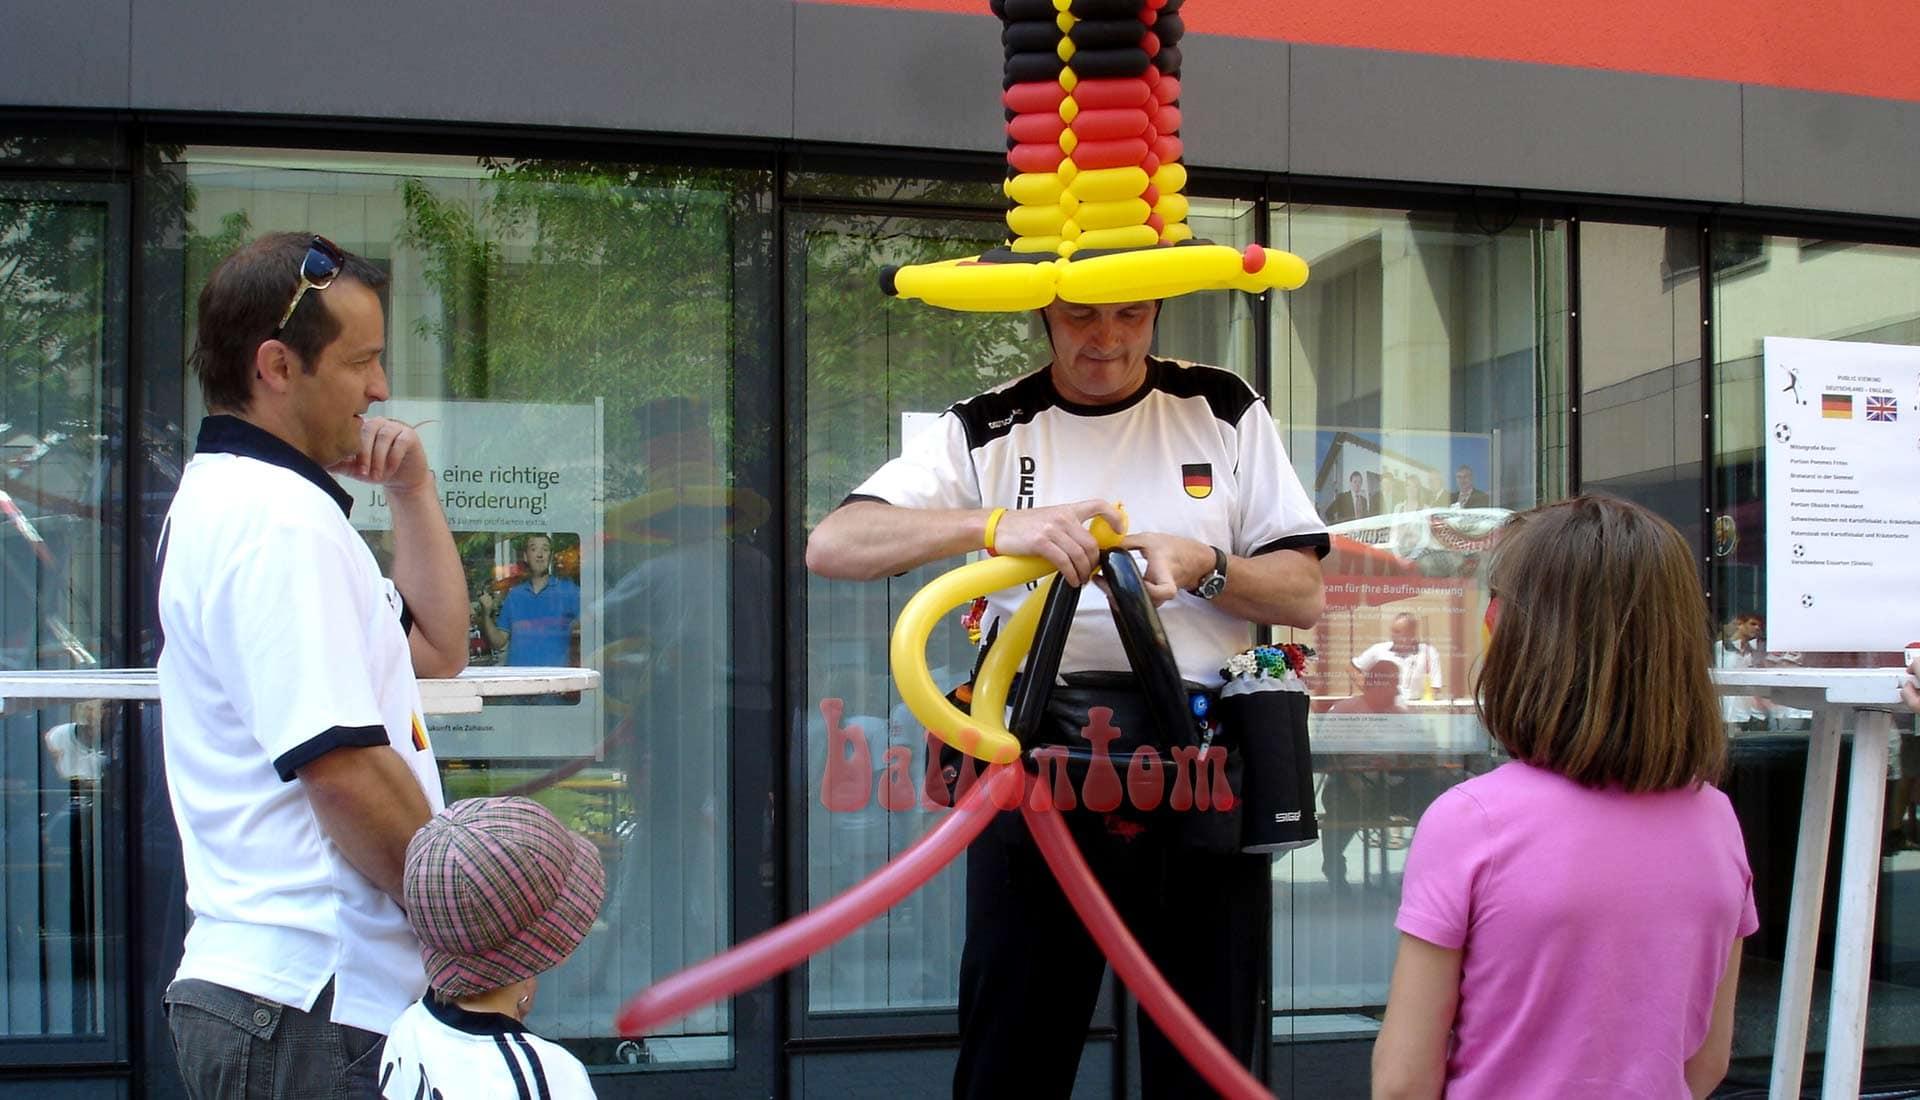 Ballonfanmodellage in Erding mit ballontom